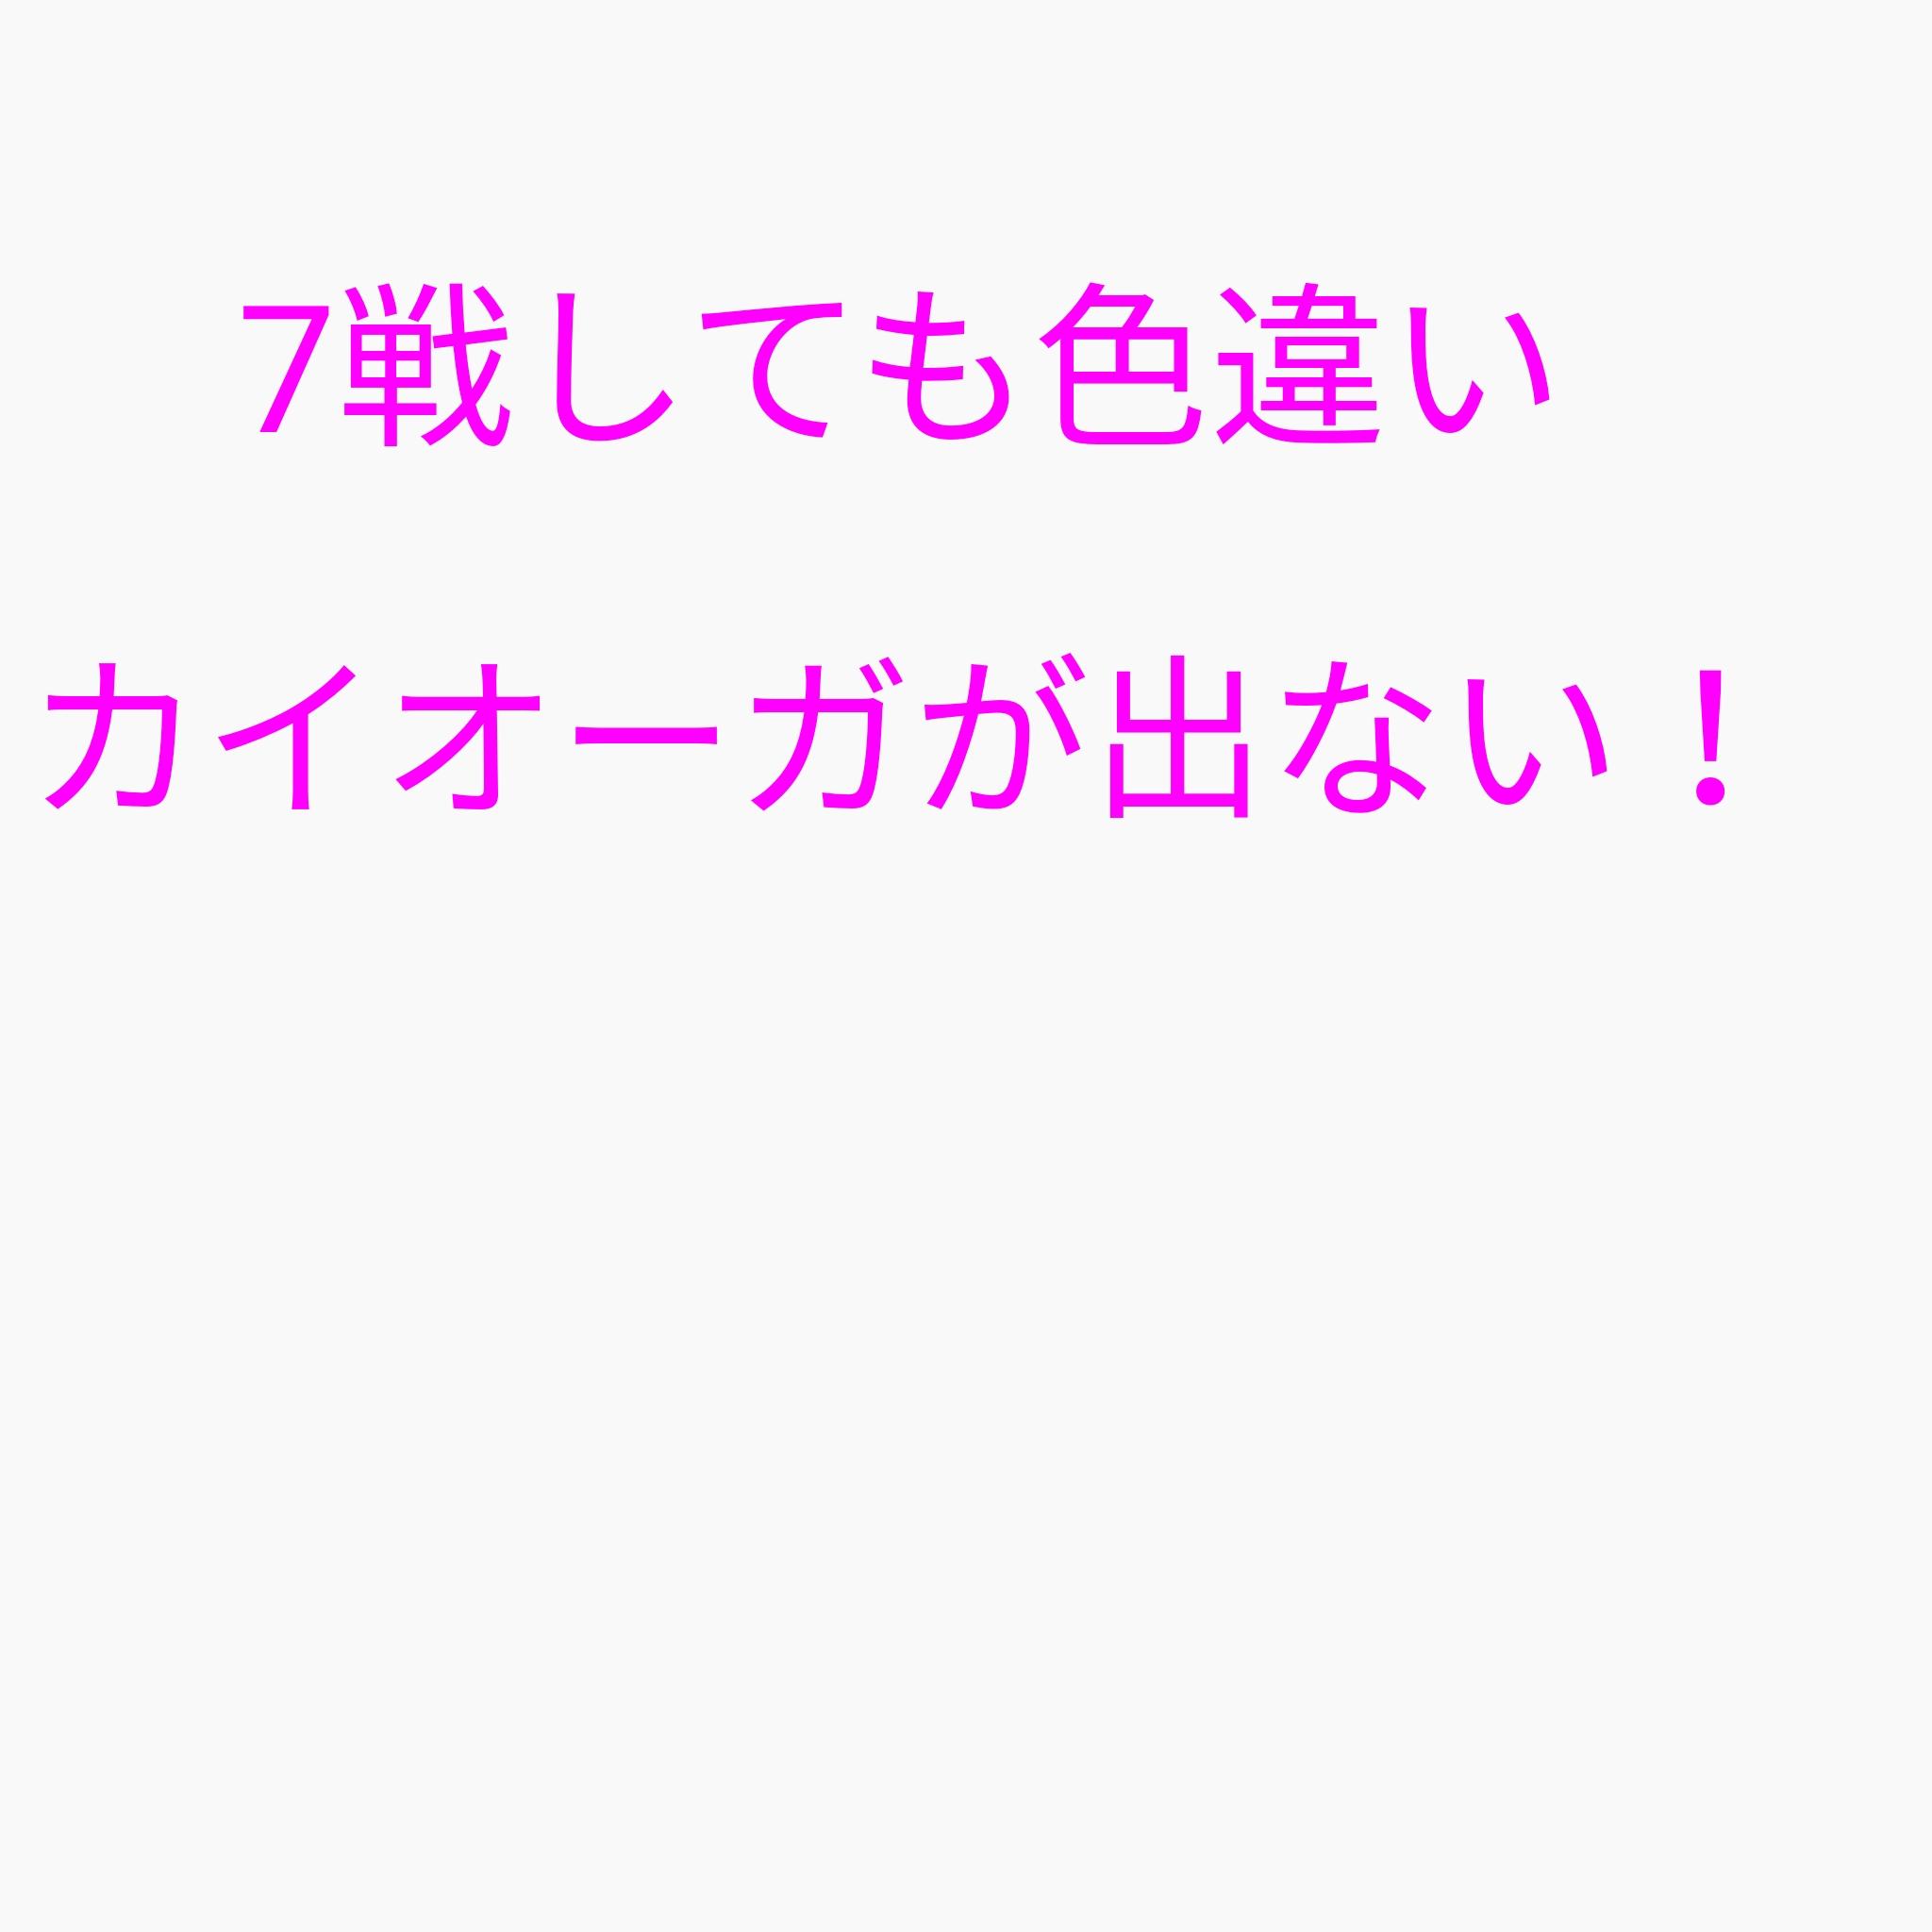 Go ハイパー 個体 ポケモン 値 リーグ